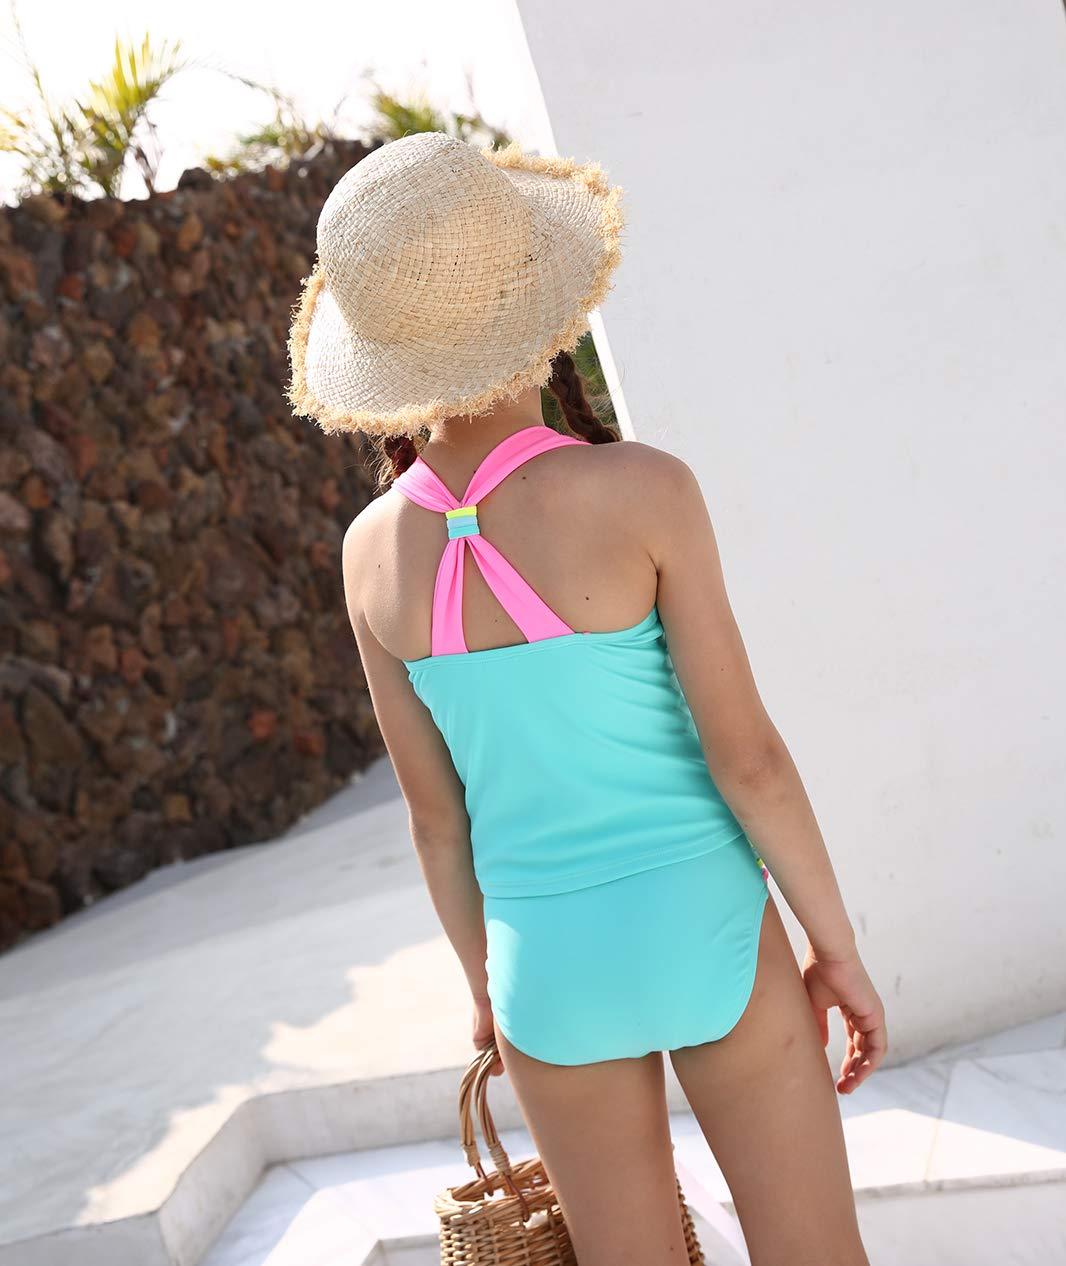 BELLOO Kids Girls Swimsuits, Two Pieces Tankini Swimsuit, Lightblue, Size 4-5